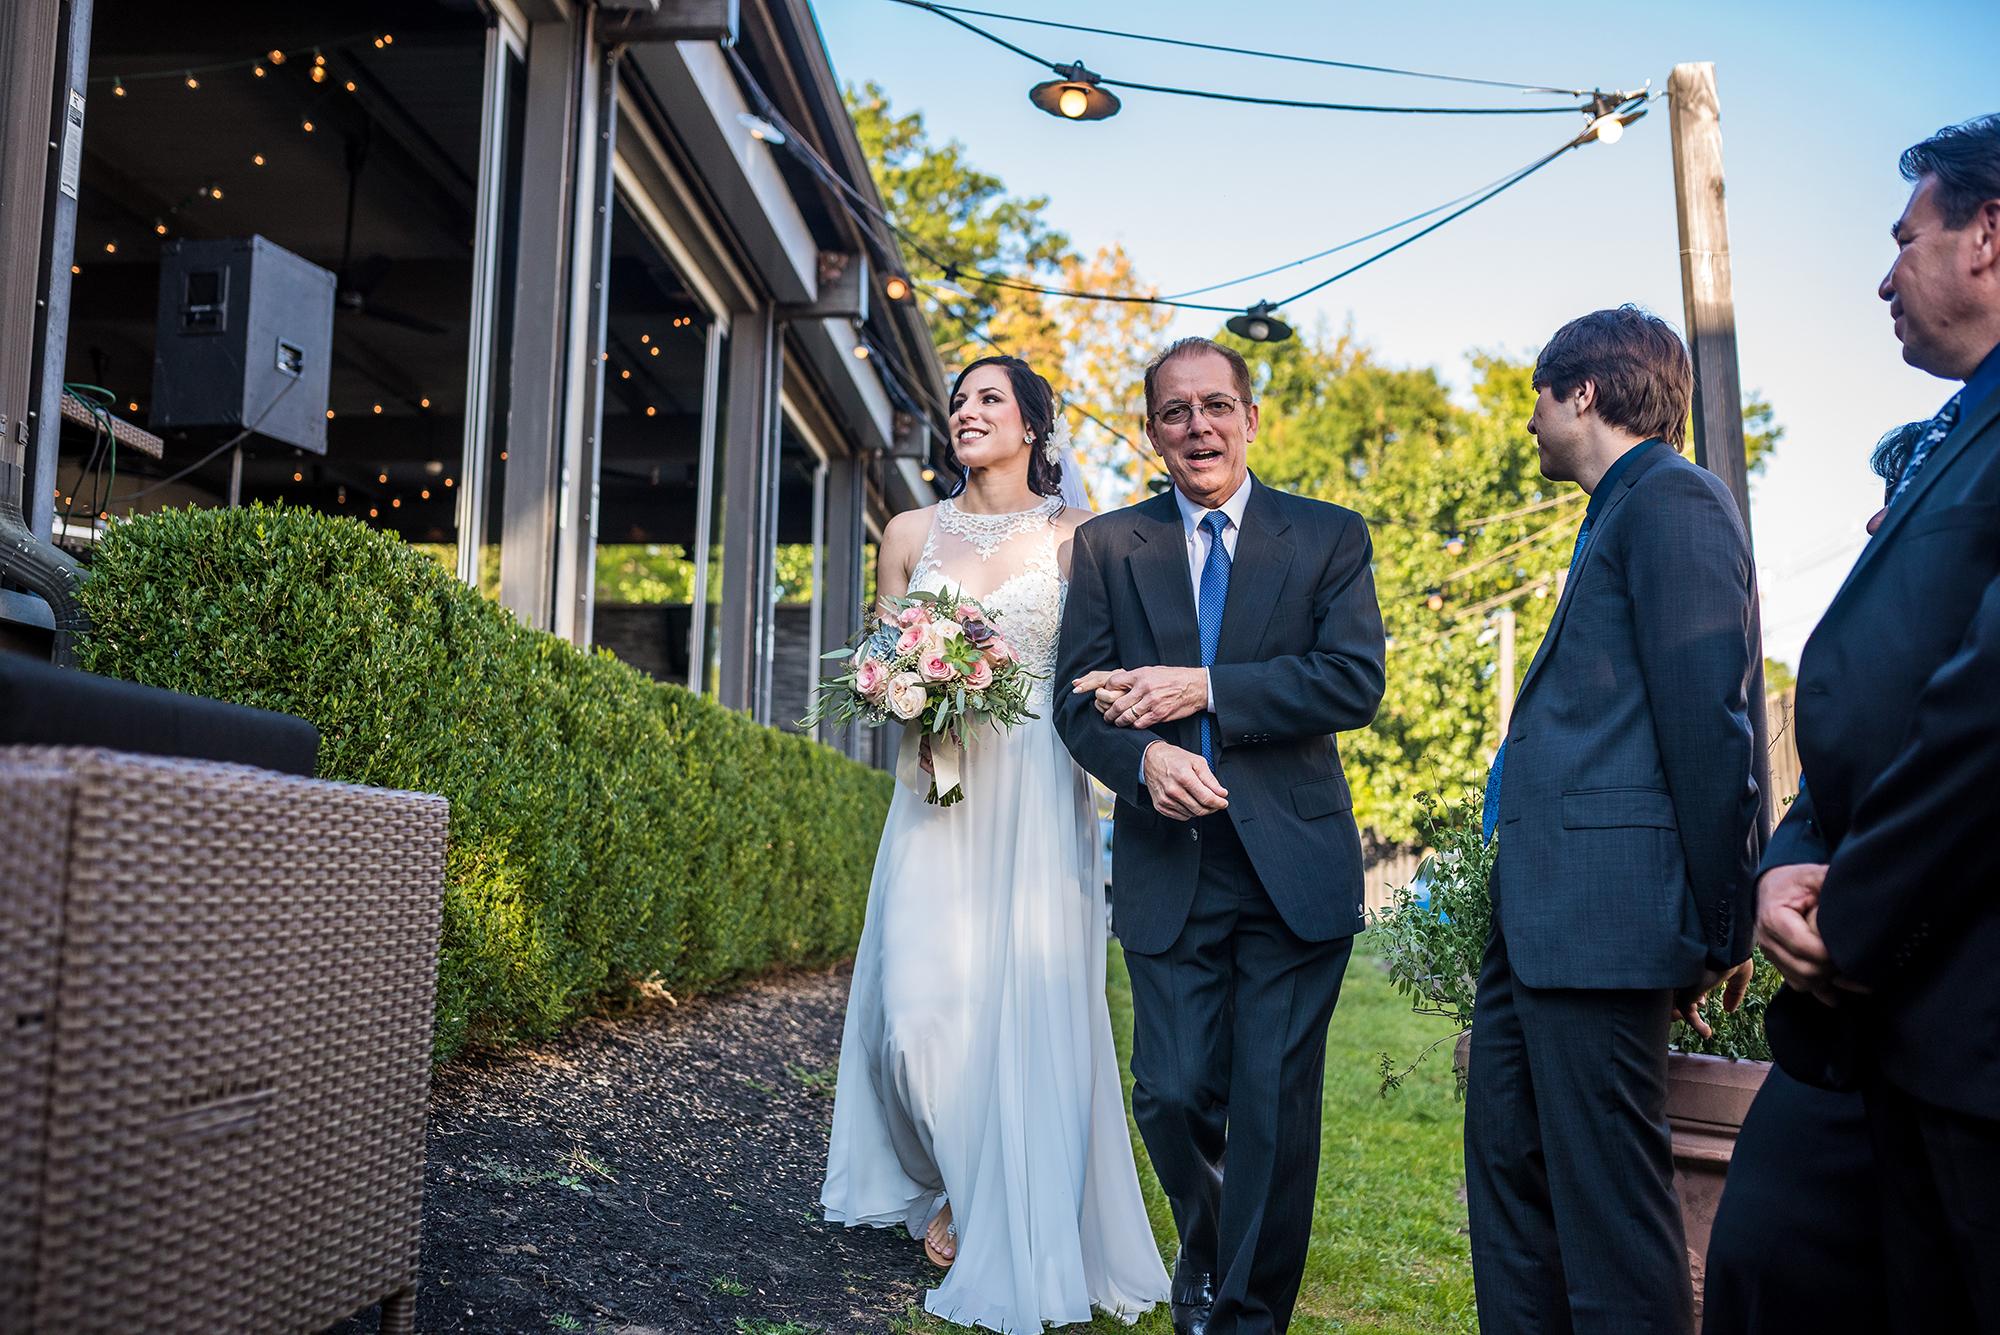 trenos-wedding-lbi-photographer-26.jpg